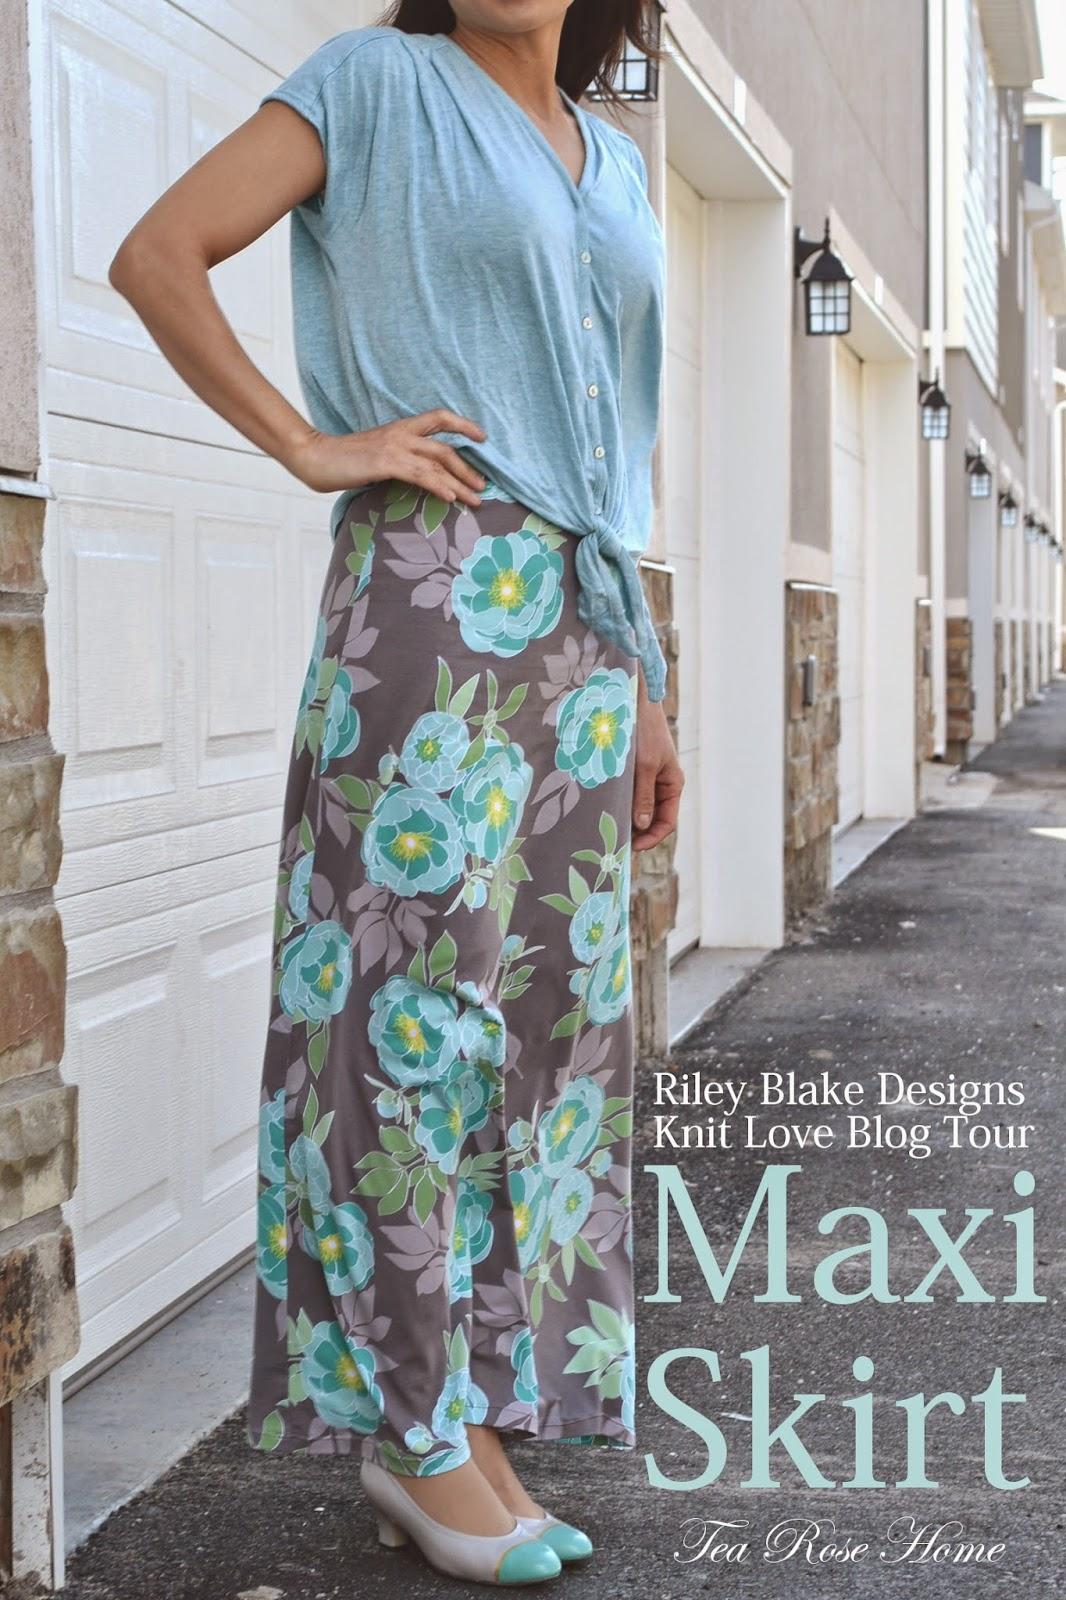 Tea Rose Home Riley Blake Designs Knit Love Blog Tour Skirt Giveaway